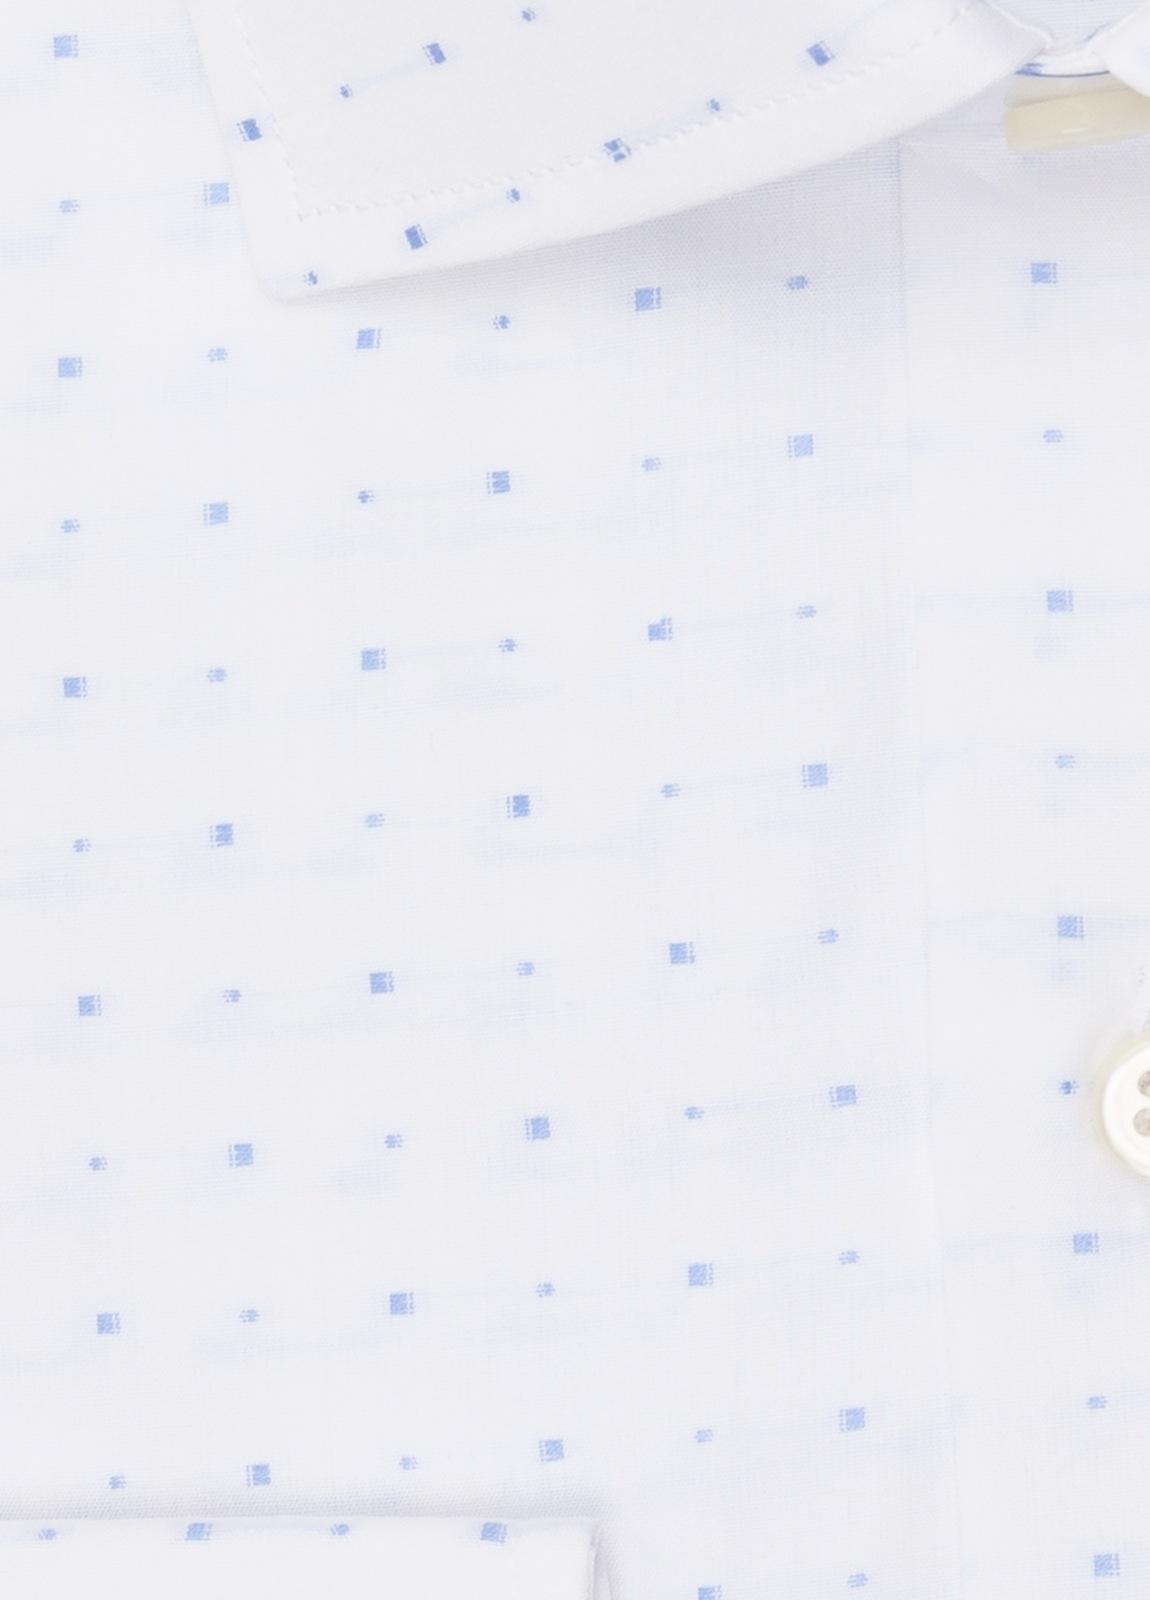 Camisa vestir FUREST COLECCIÓN SLIM FIT cuello italiano Fil Coupé dibujo geométrico - Ítem2